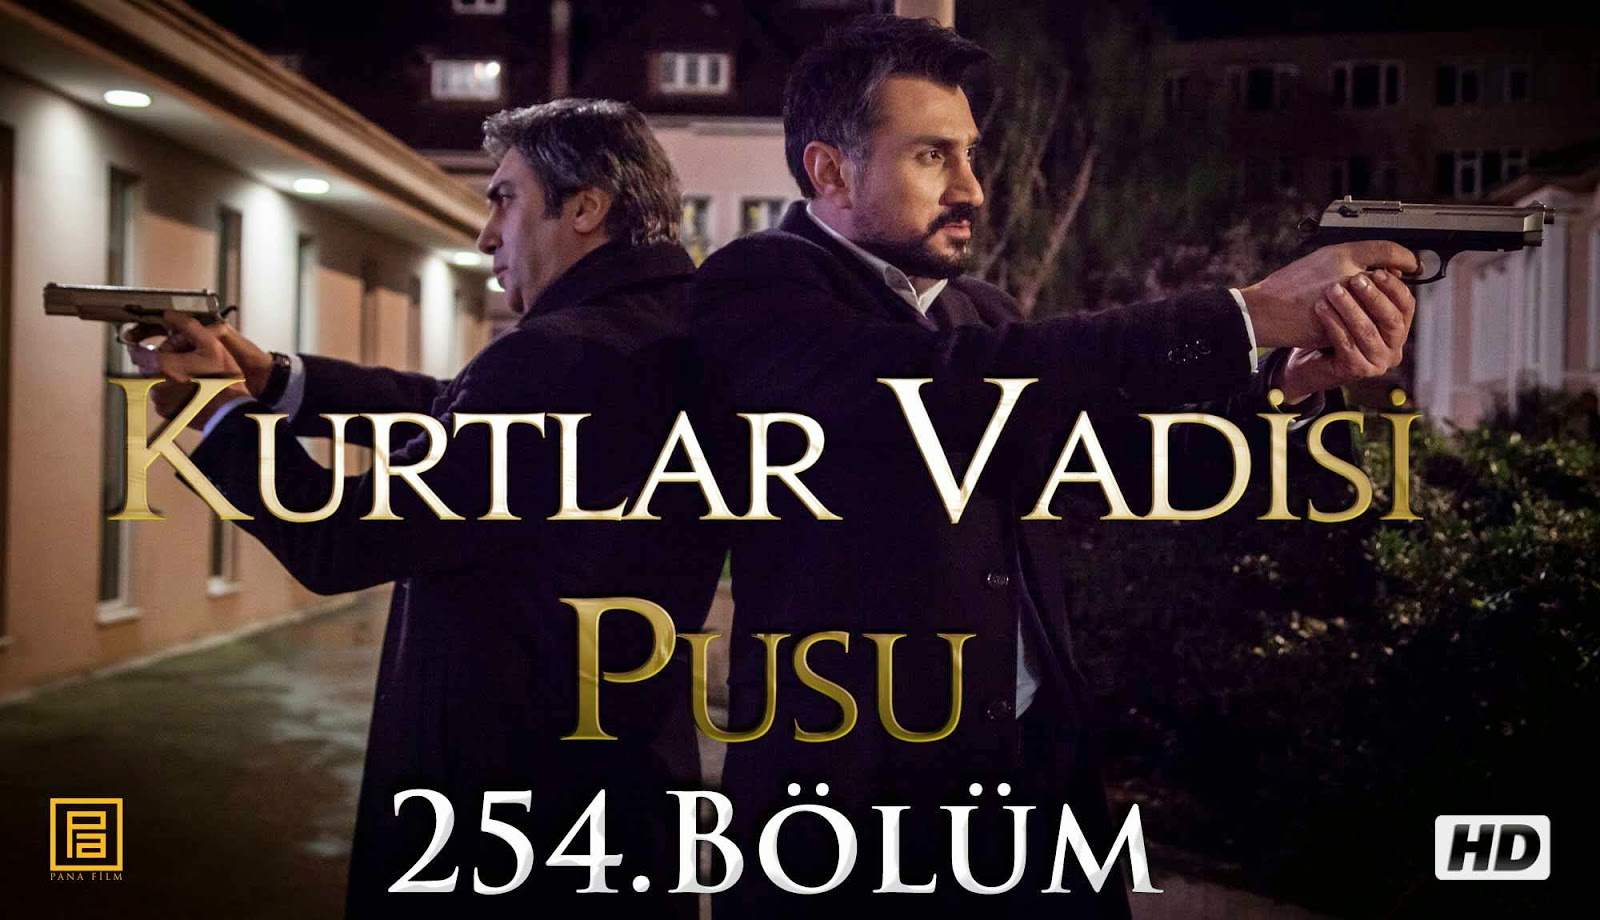 http://thealemdar.blogspot.de/p/kurtlar-vadisi-pusu-254bolum.html